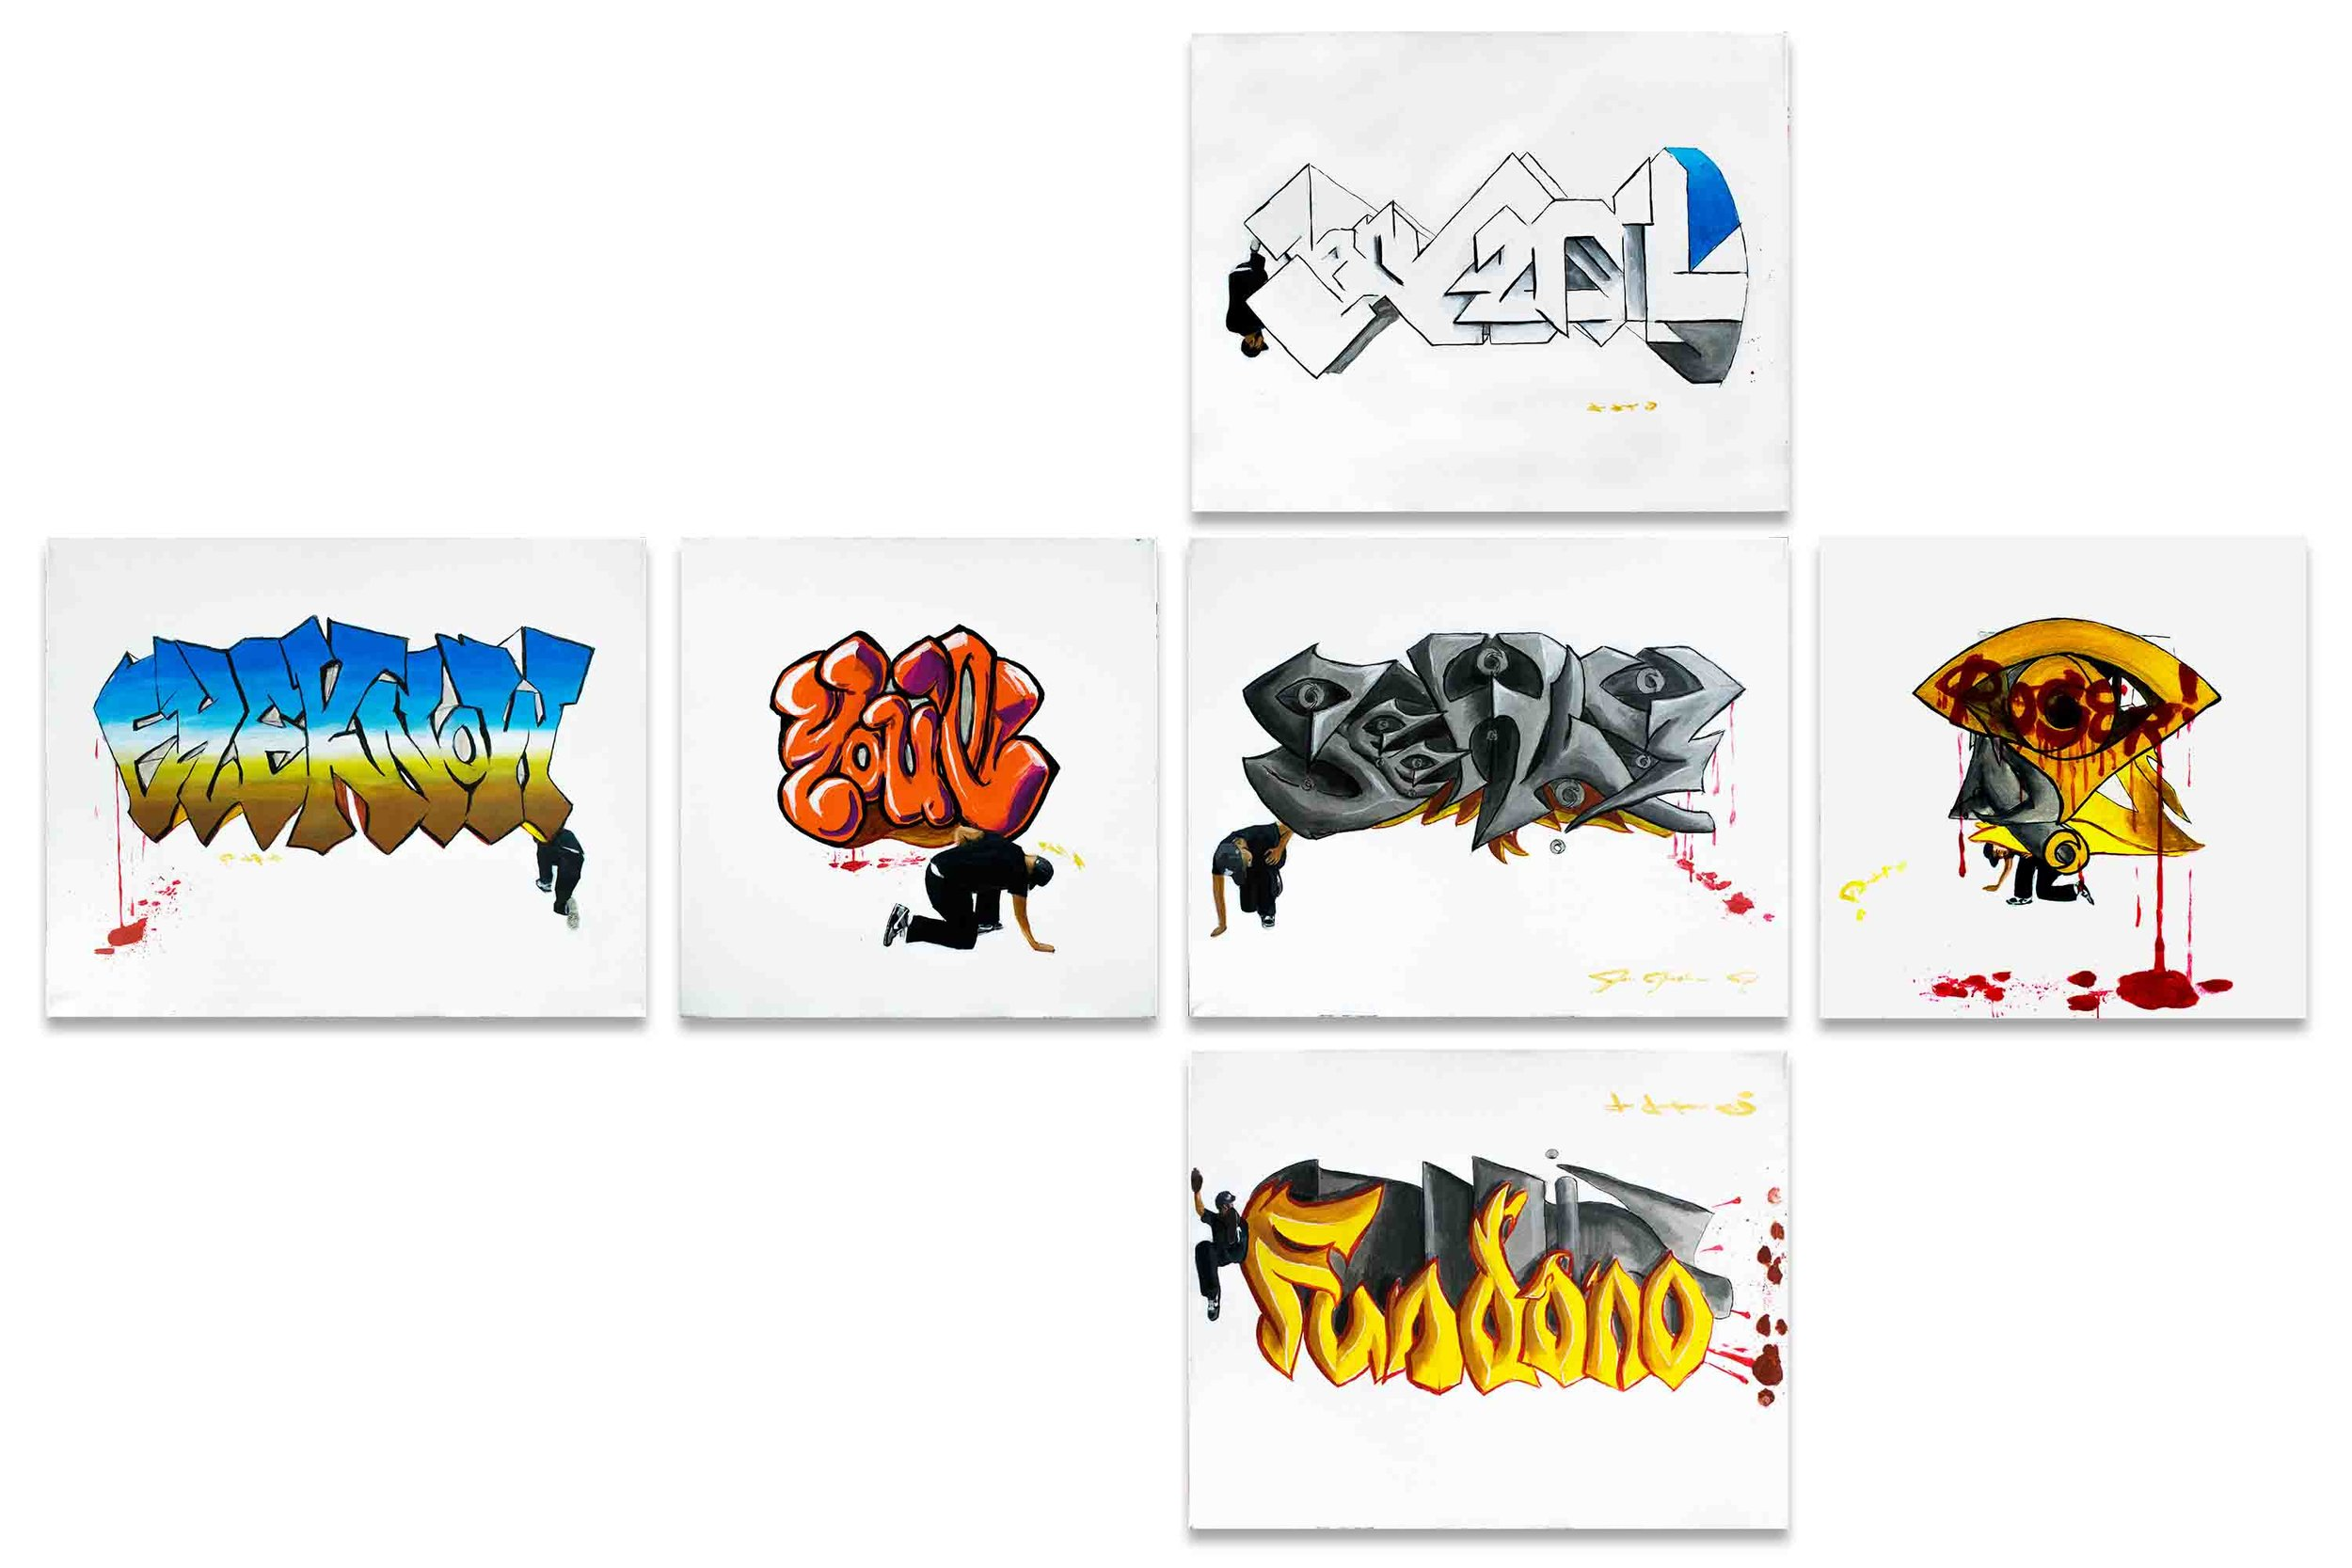 Super-Saturated pseudo-Graffiti